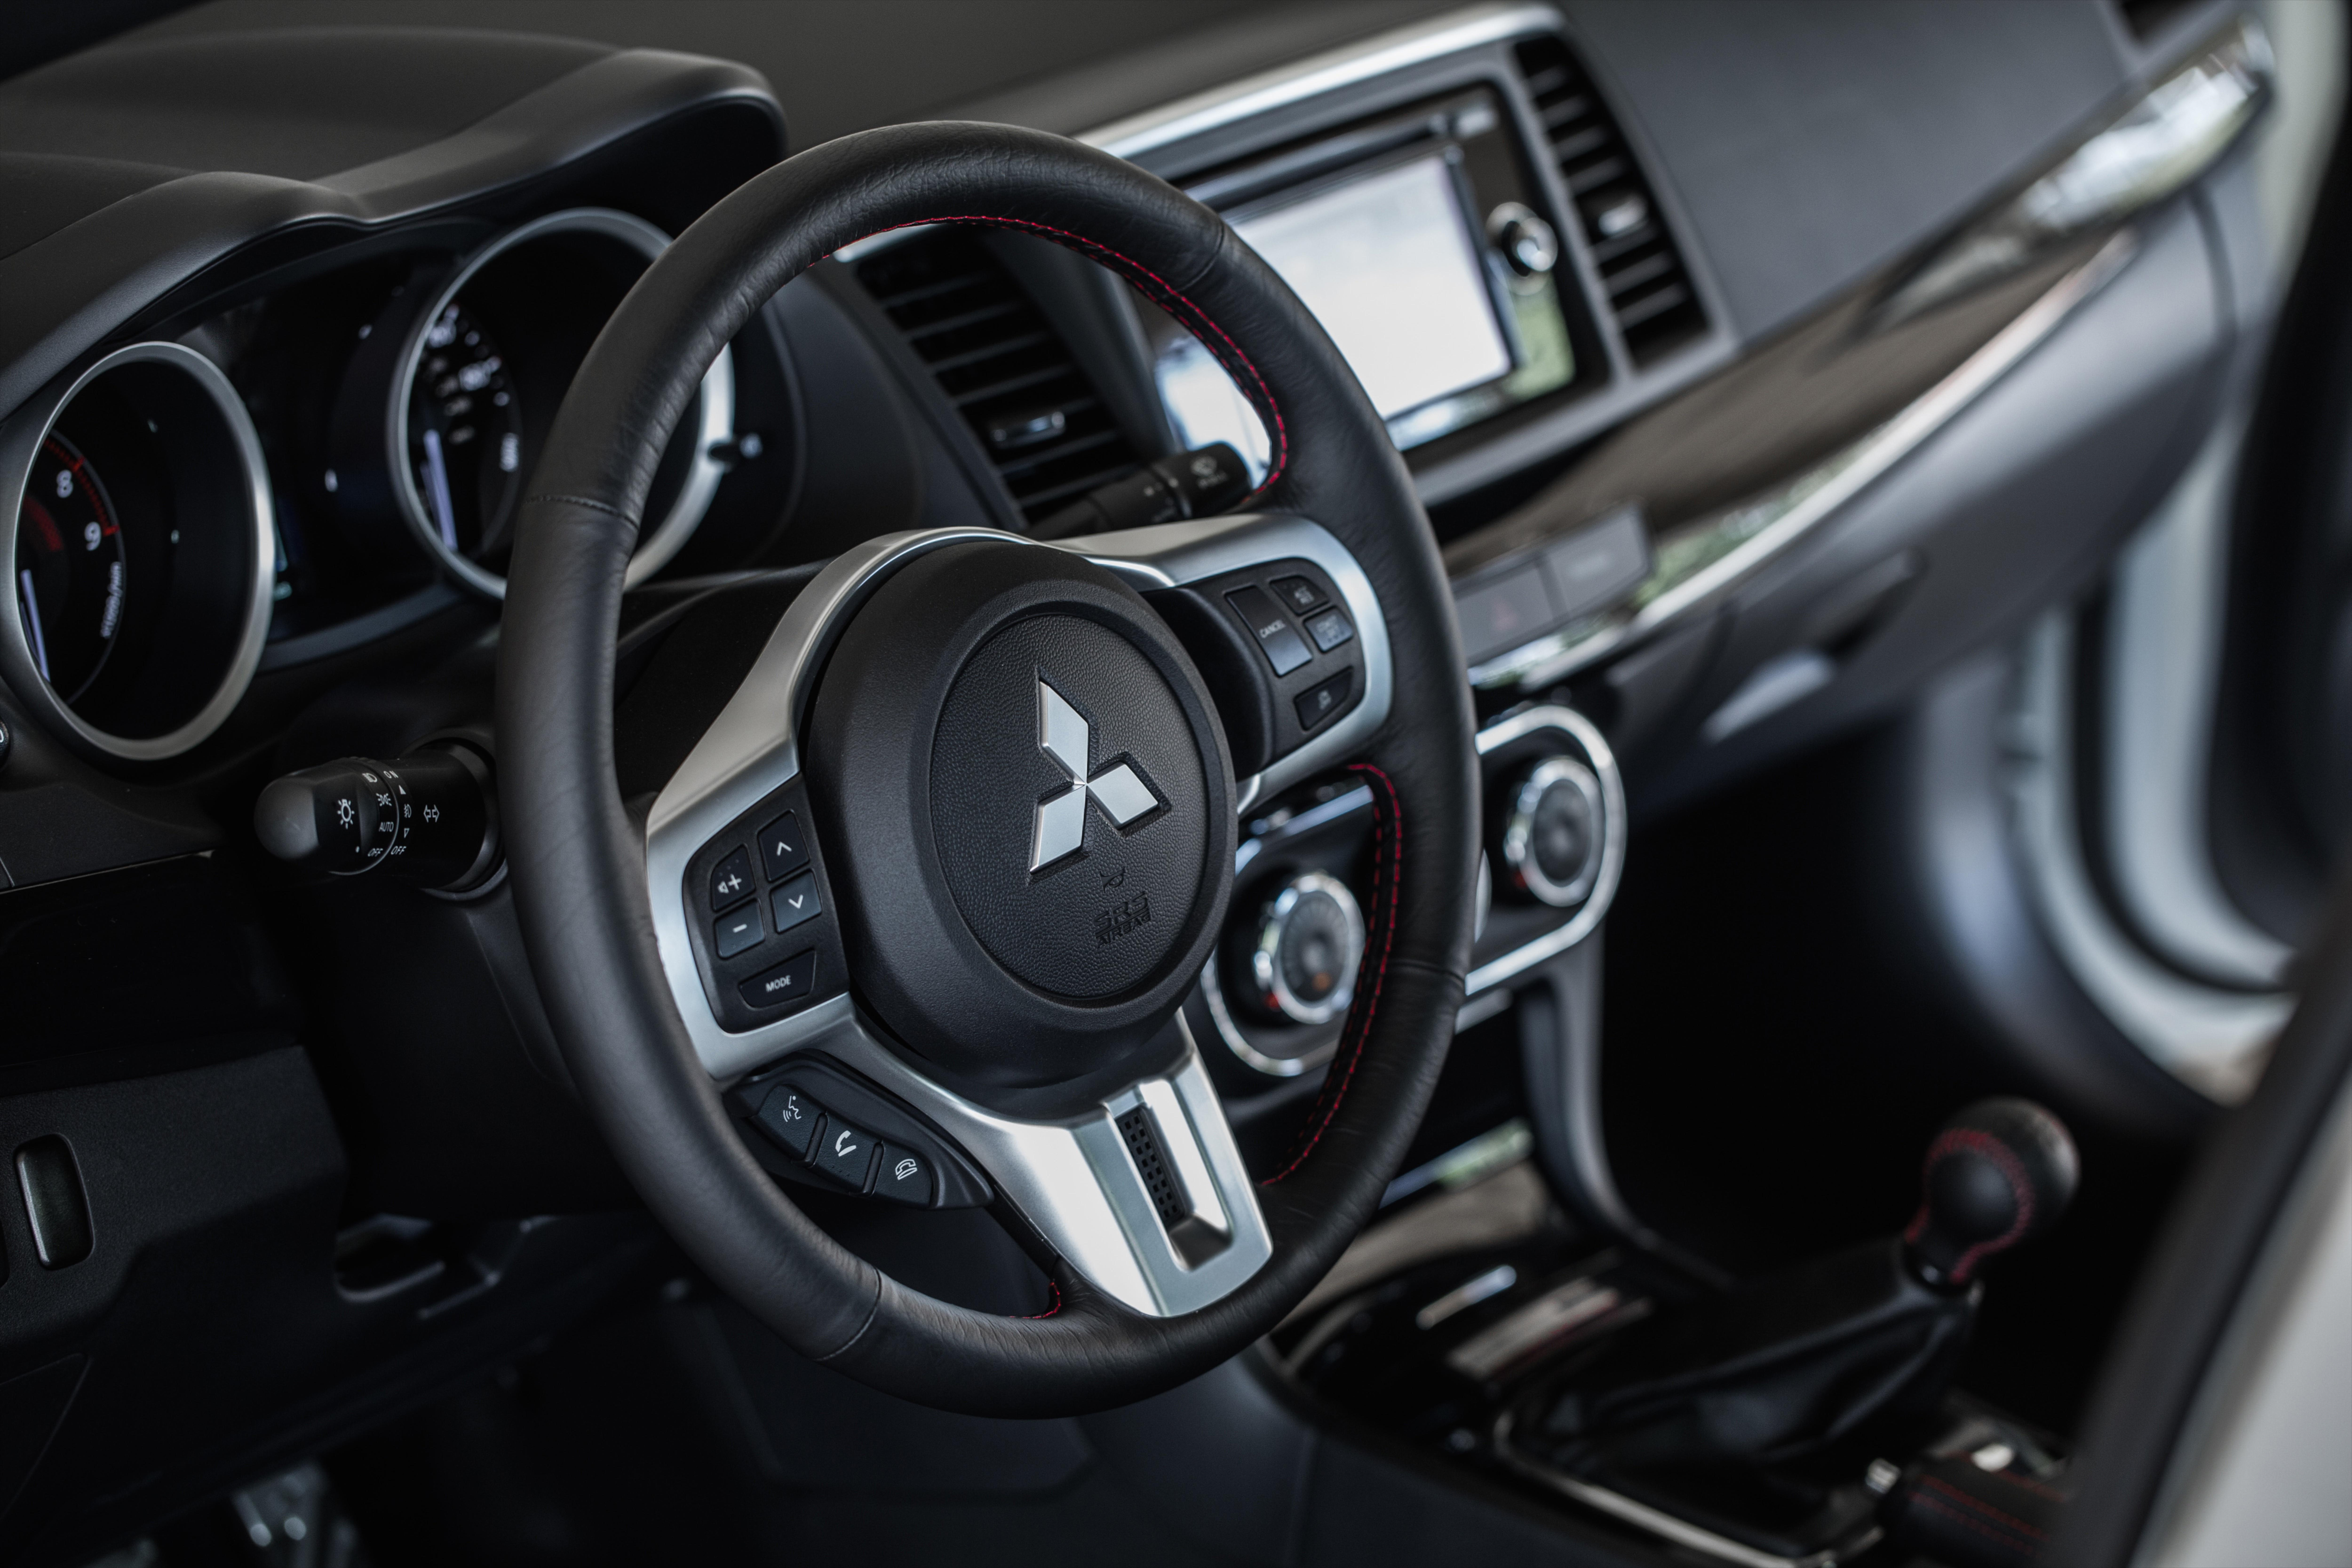 Farewell to Mitsubishi Evo X with 303 hp Final Edition Image #388256